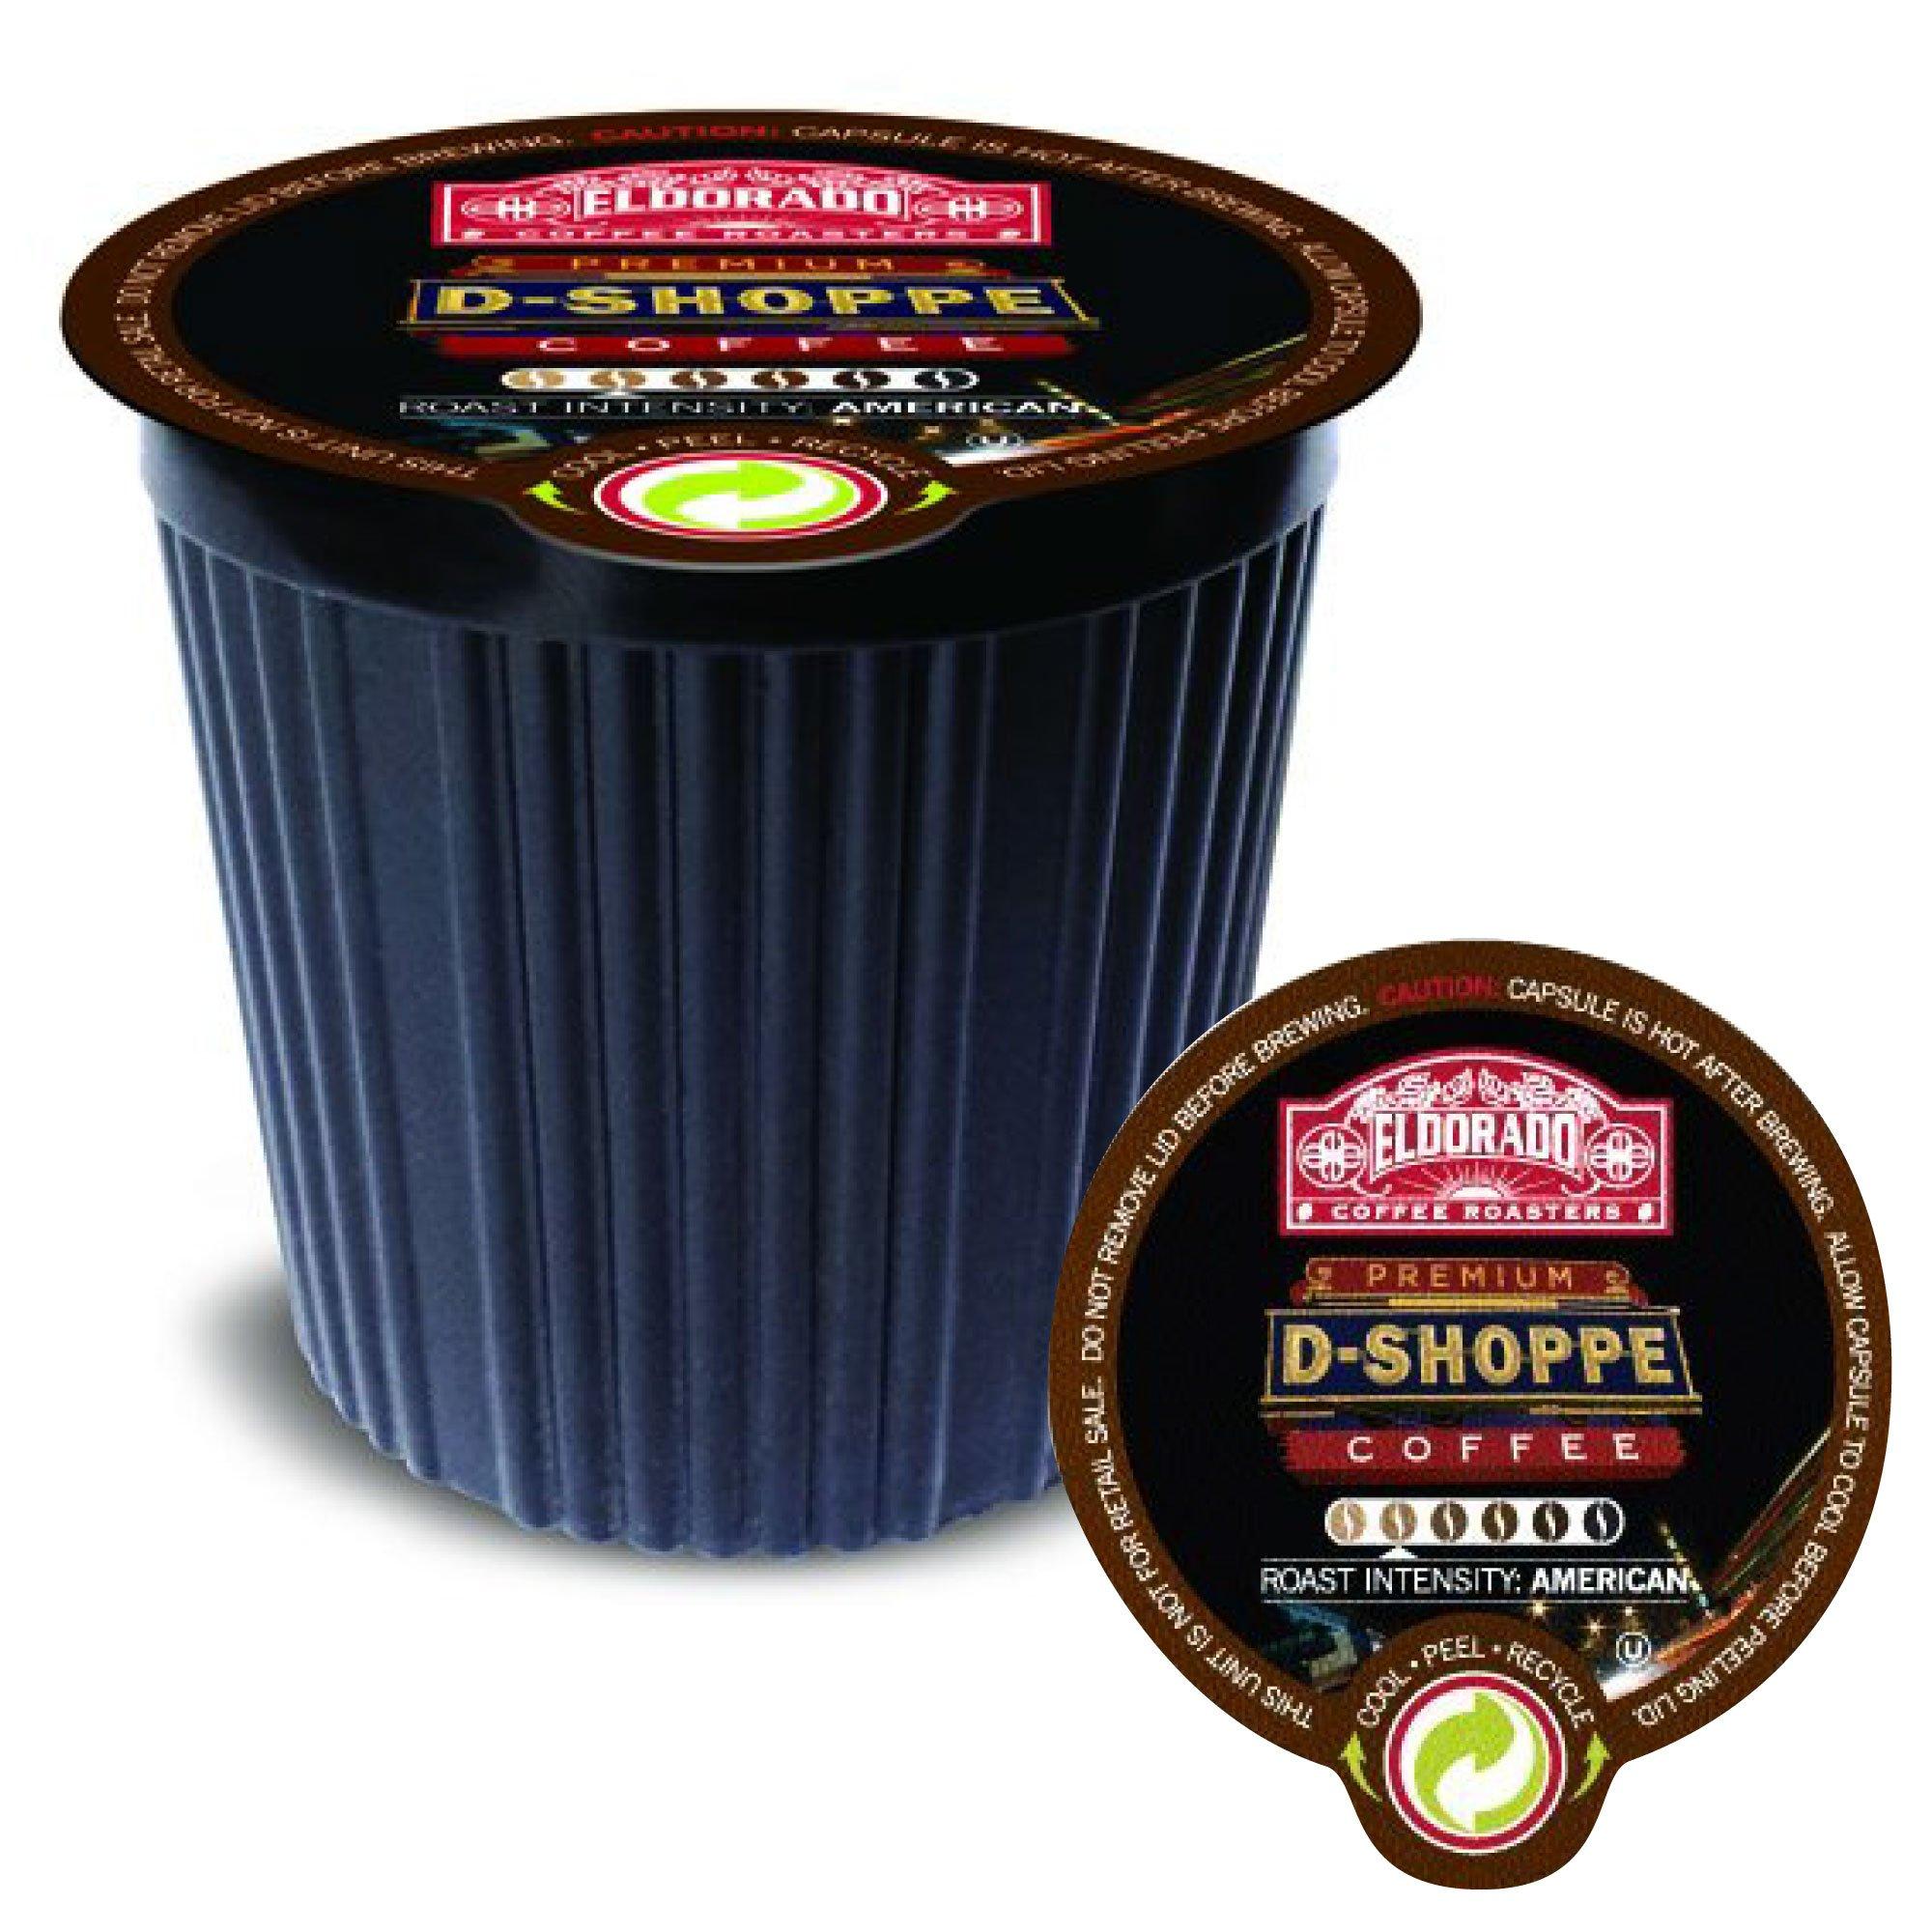 Eldorado Coffee Roasters Coffee Pods D-Shoppe  K Cups for Keurig Home Brewers, 12 Single Serve Capsules